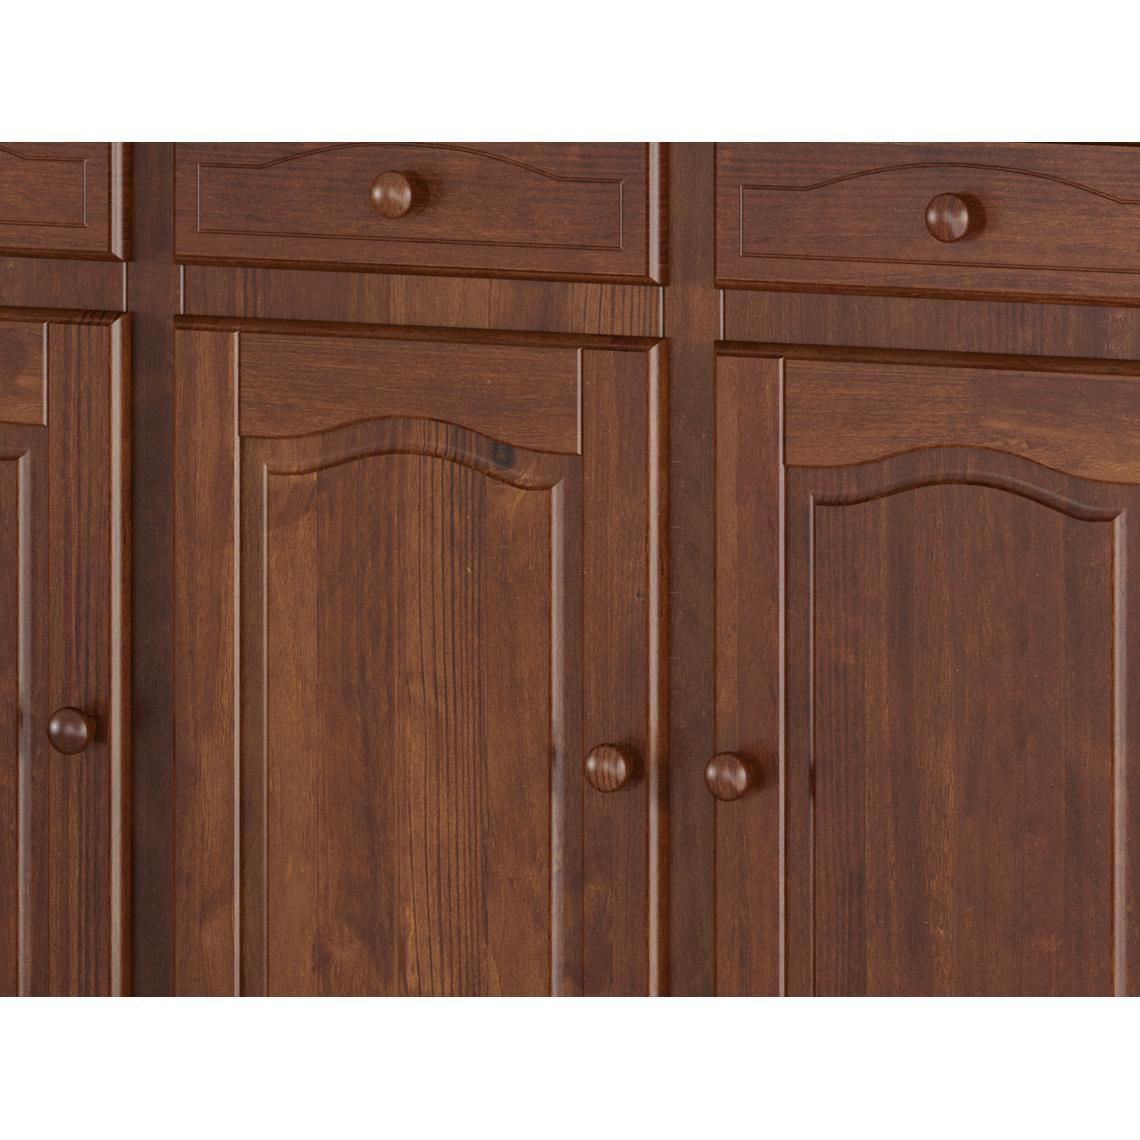 Bahut 3 tiroirs 3 portes en Pin Massif Mocca ALTIM qV5Ml